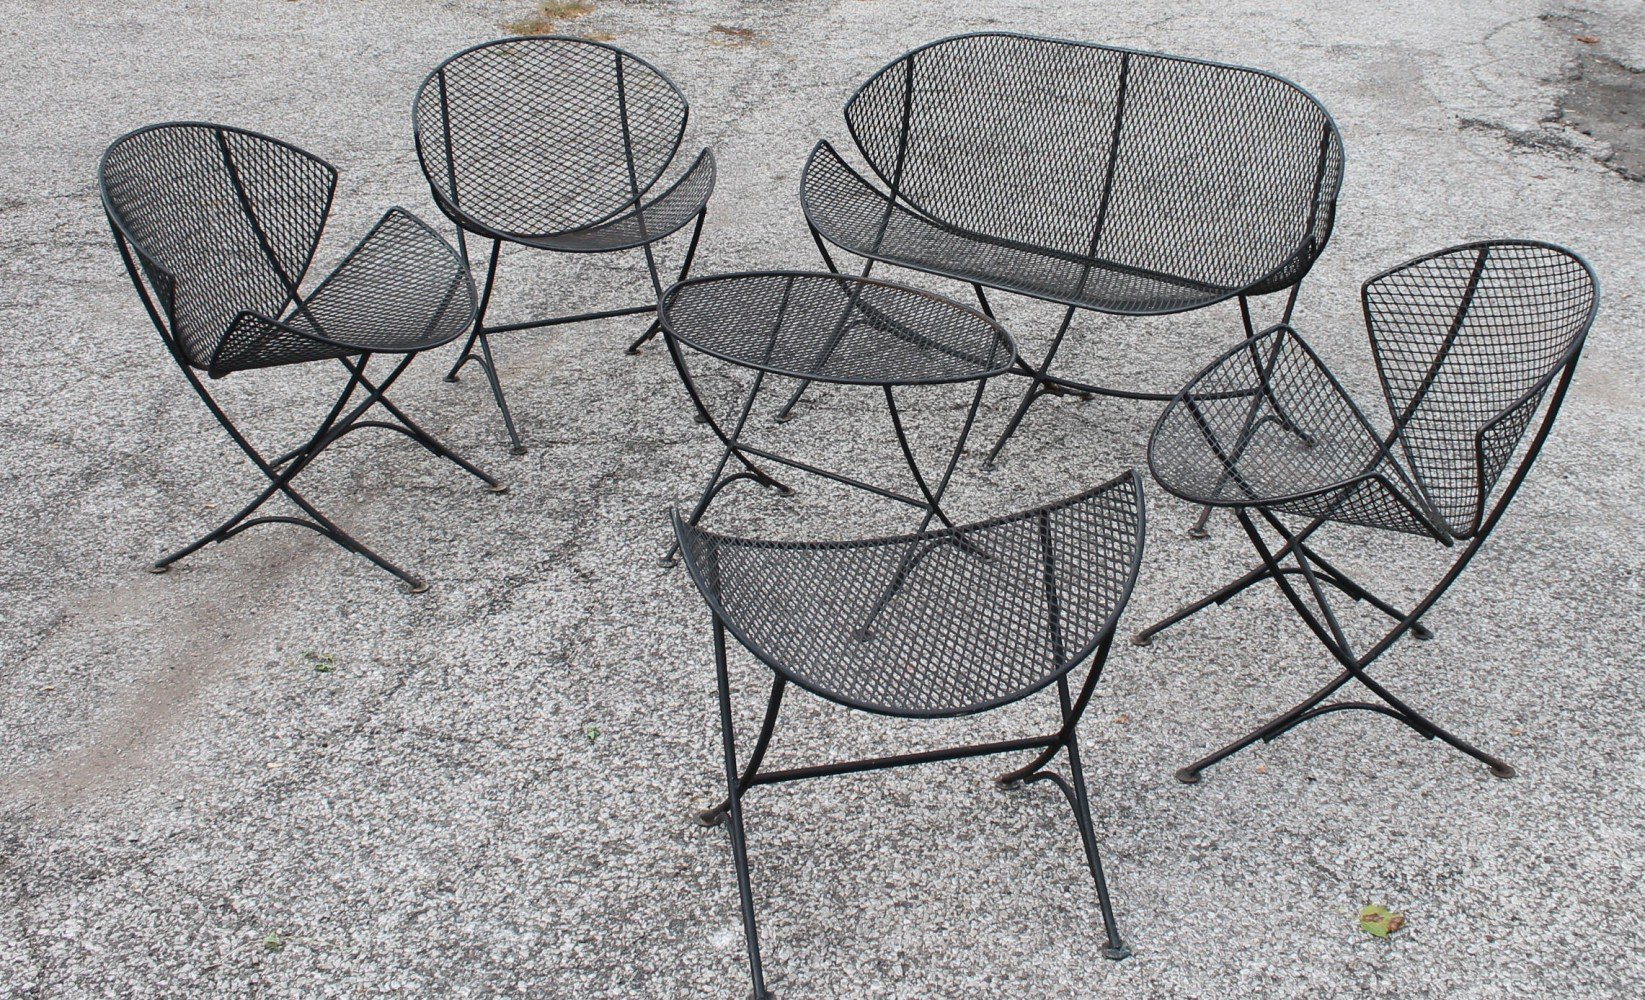 Maurizio Tempestini Clamshell or Orange Slice Garden Furniture by 20th Century Italian School